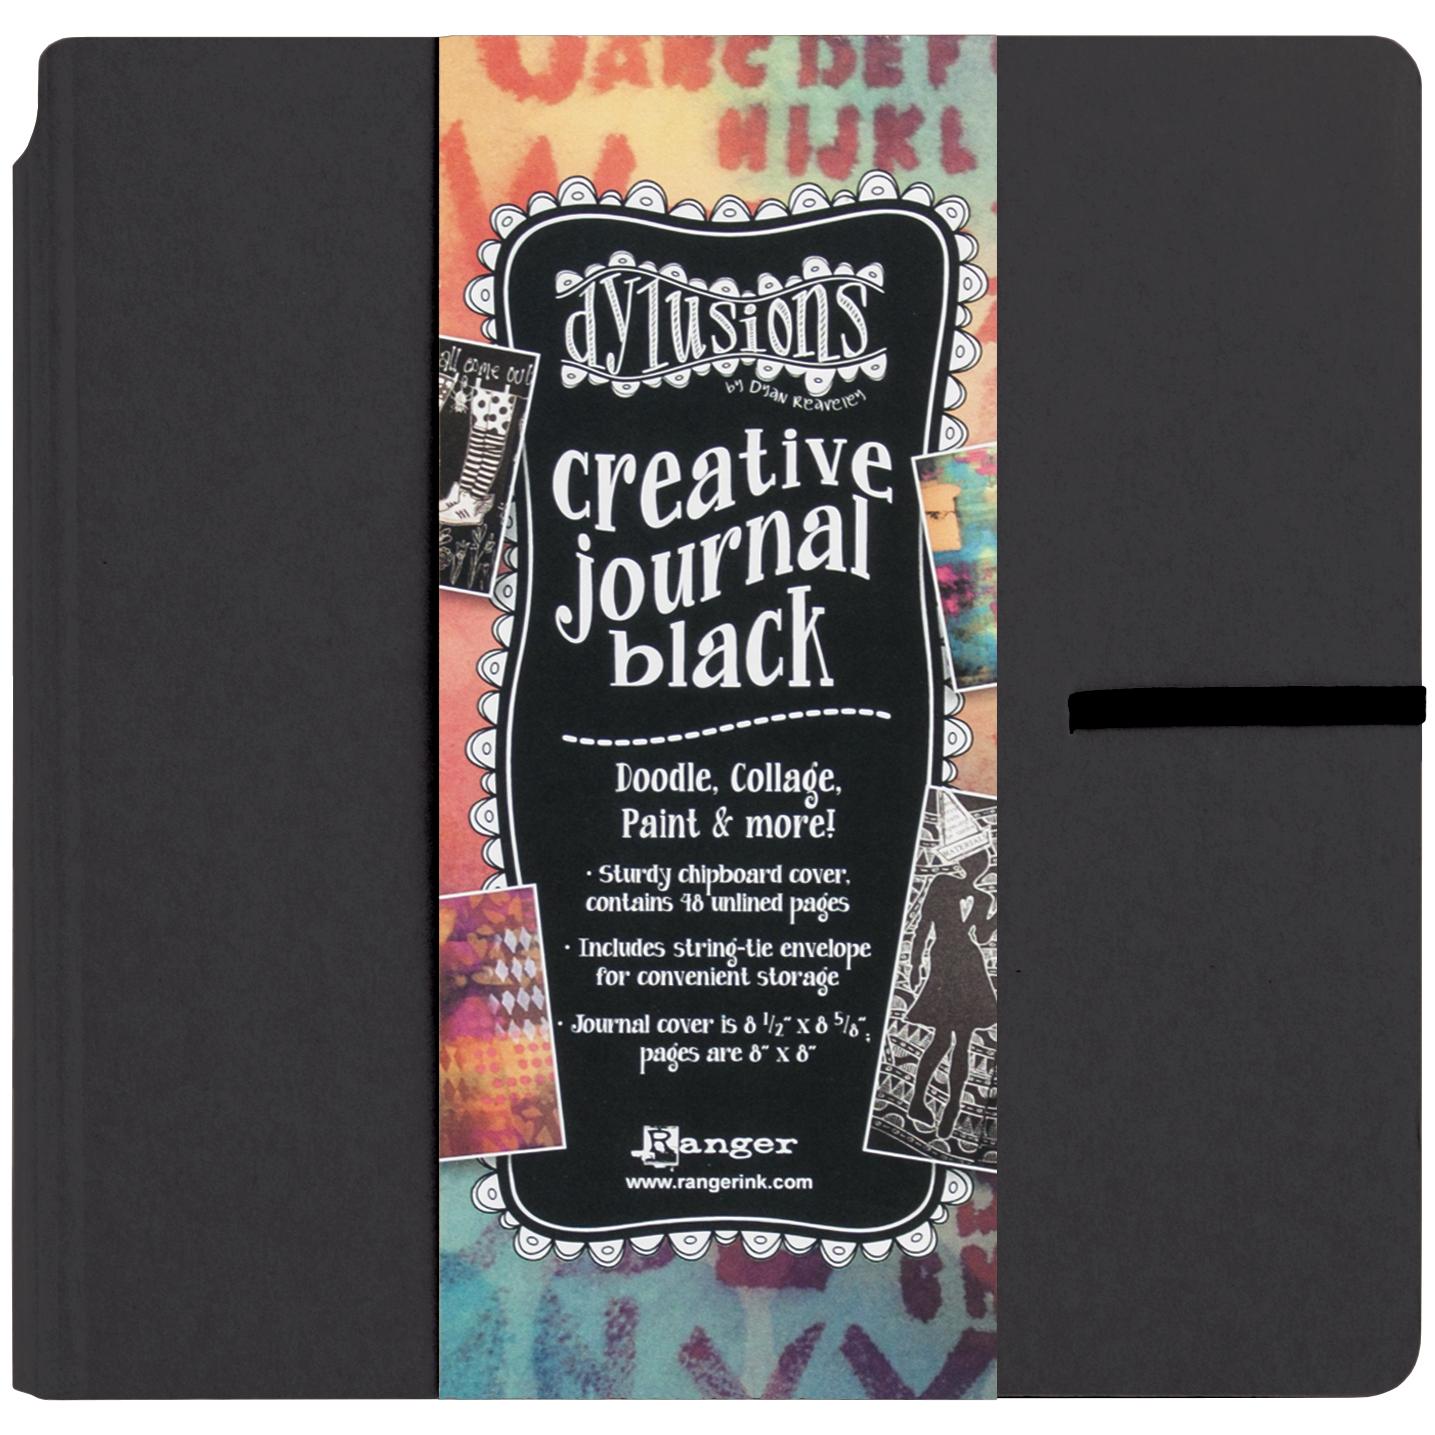 Black creative journal square